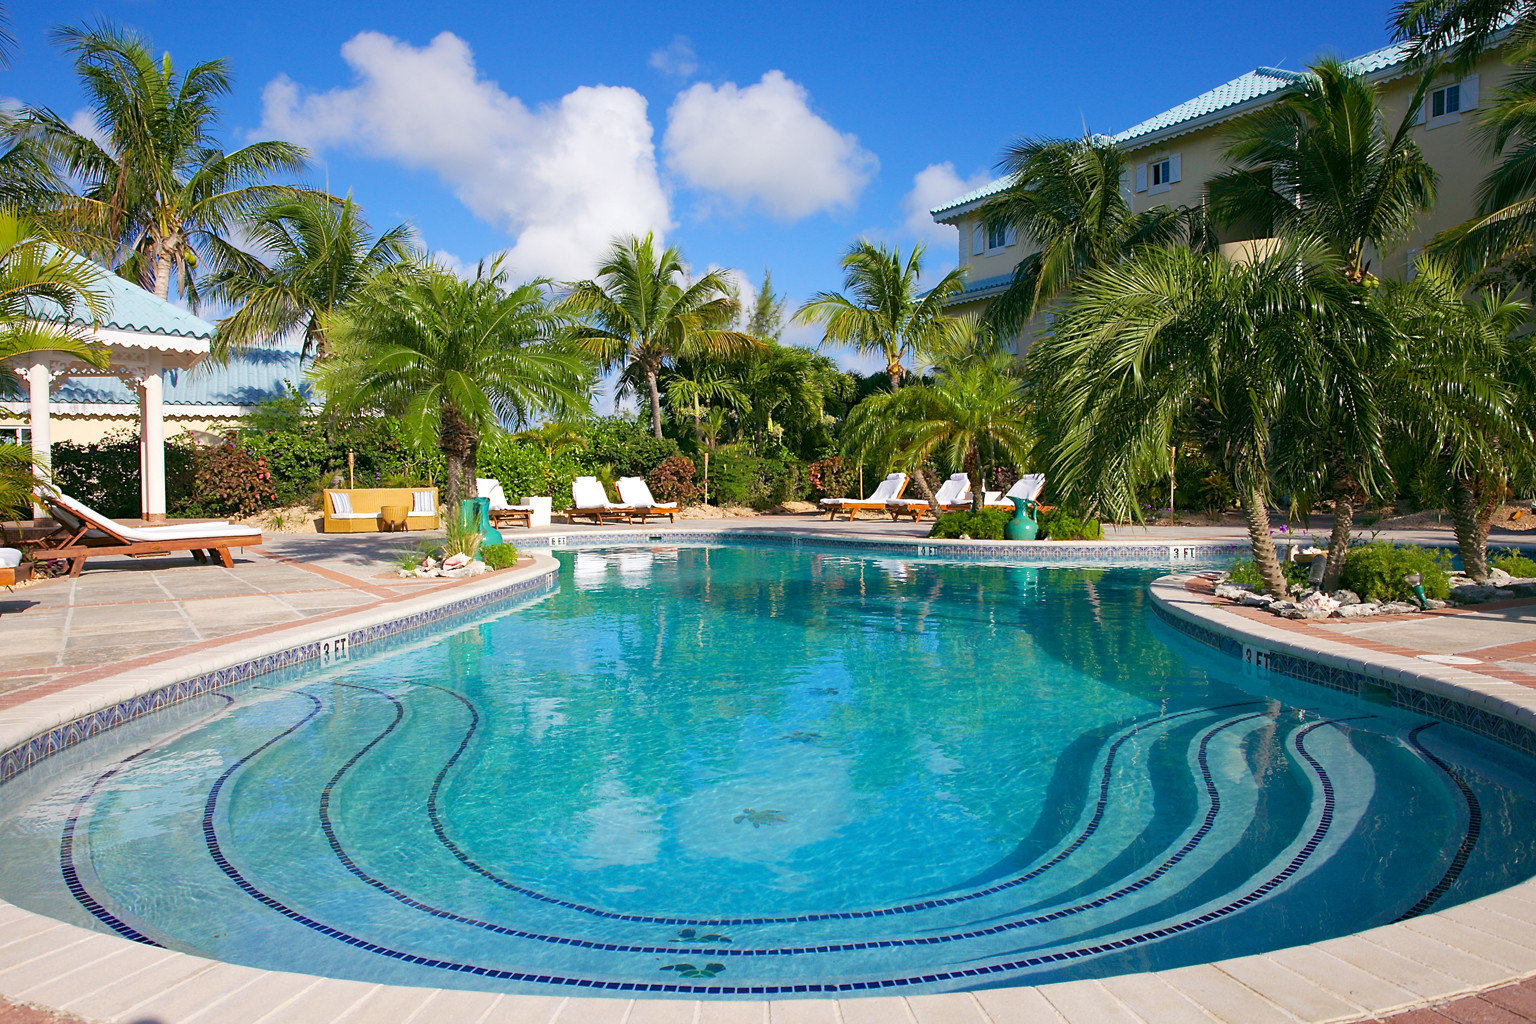 All-Inclusive Resorts Beachfront Boutique Luxury Pool Resort tree sky ground swimming pool property leisure caribbean resort town Villa Lagoon backyard blue palm